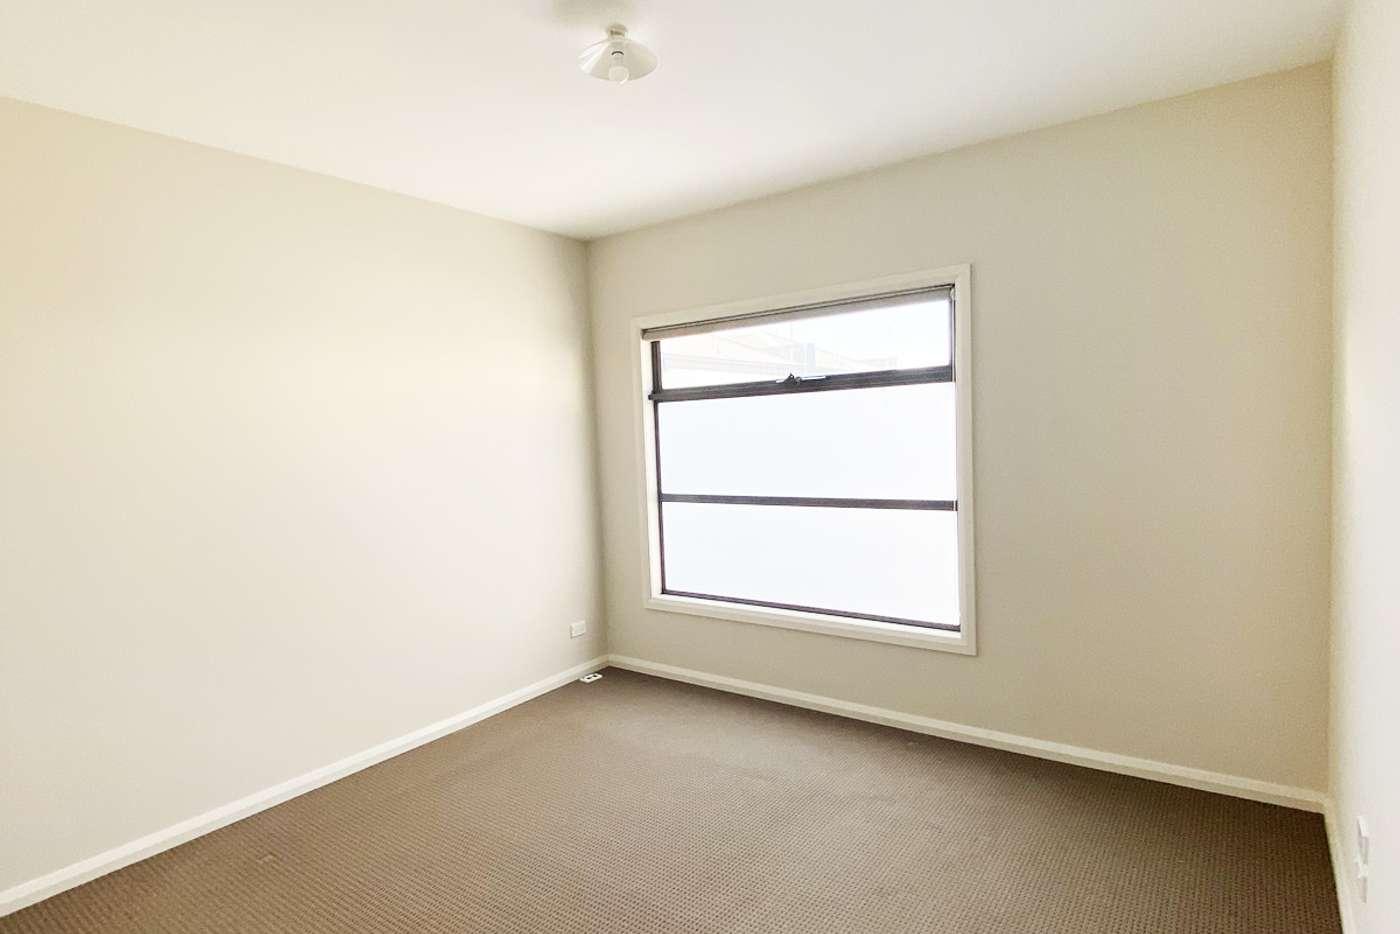 Sixth view of Homely townhouse listing, 7/45 Lygon Drive, Craigieburn VIC 3064